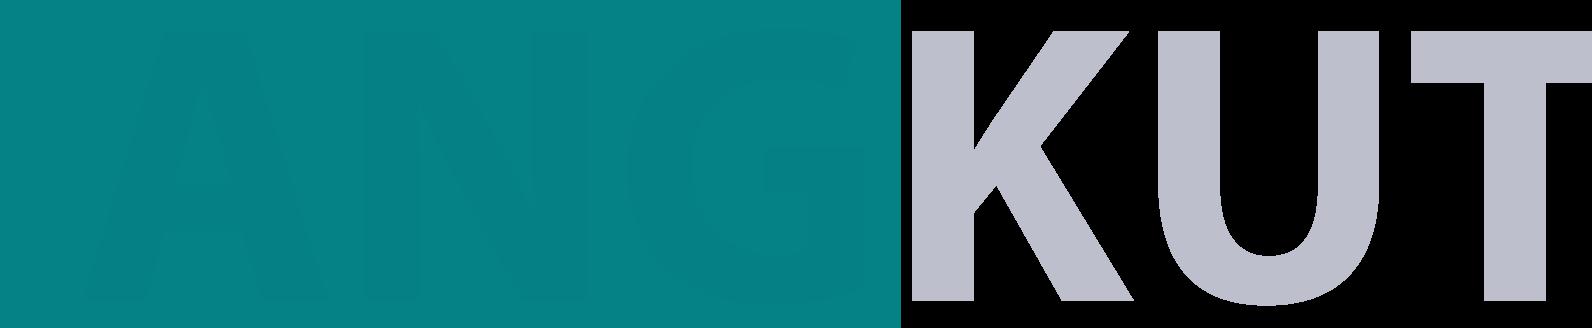 angkut logo.fw